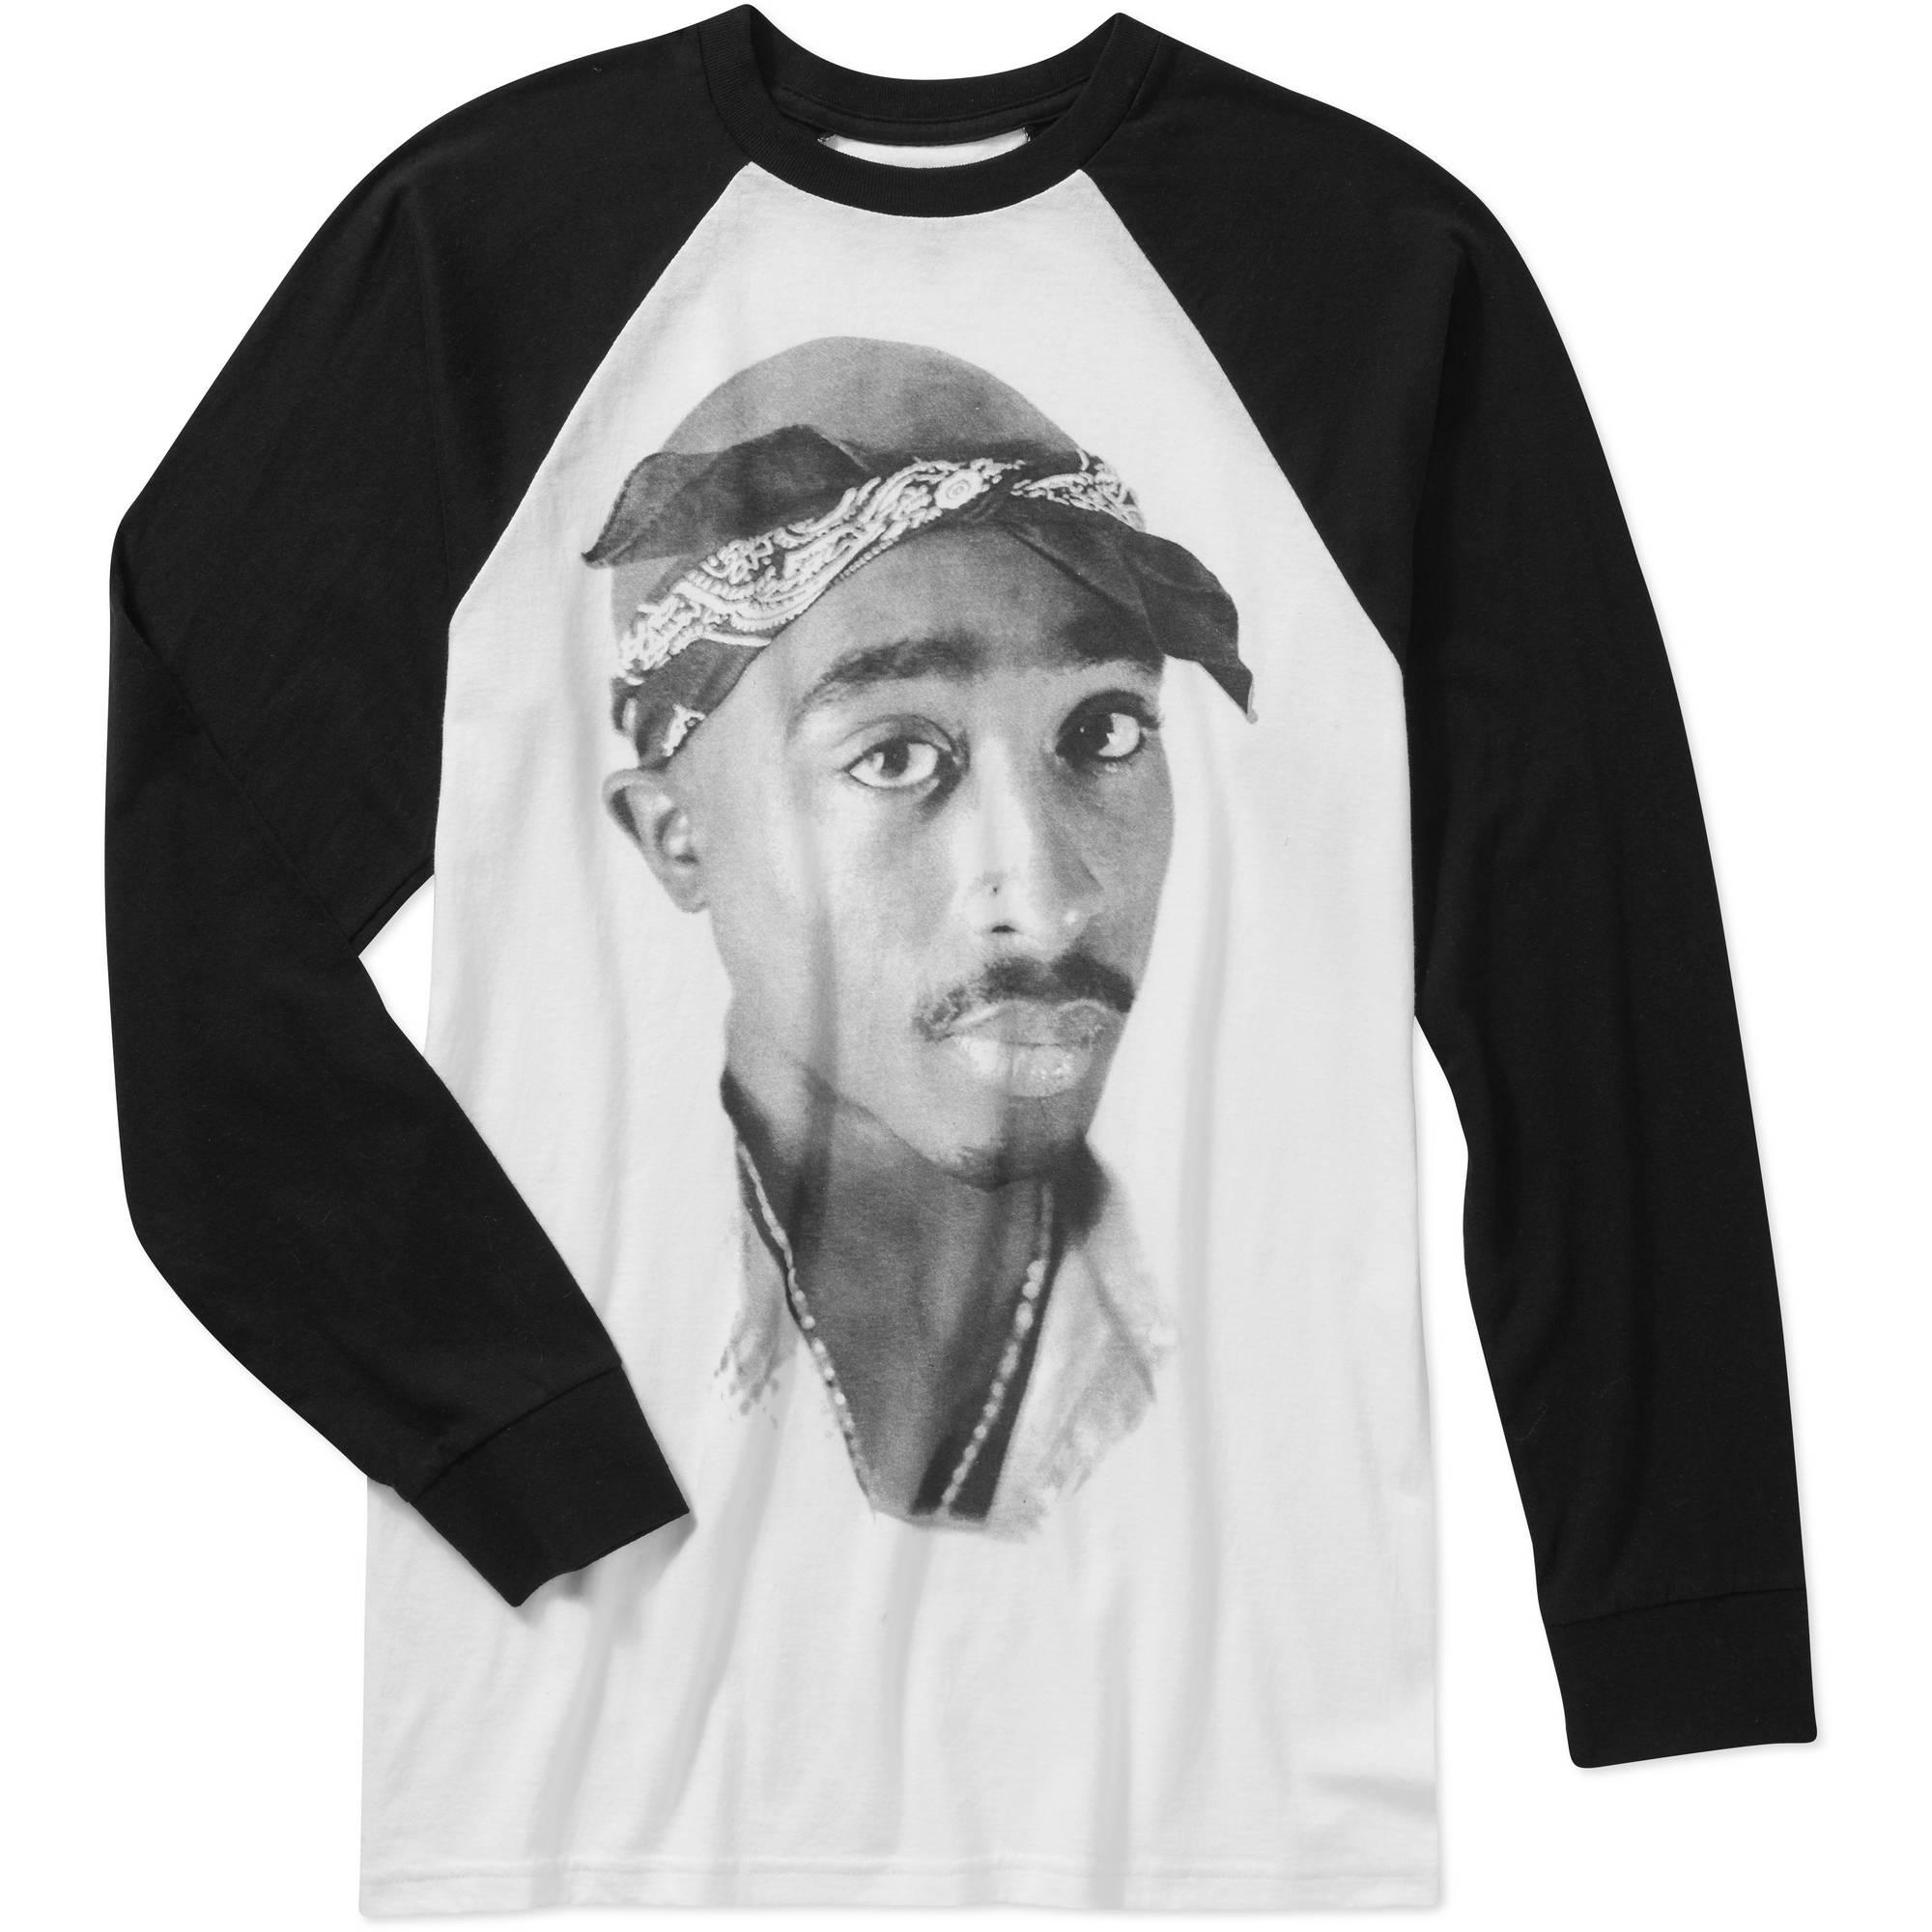 Black t shirt at walmart - Black T Shirt At Walmart 41